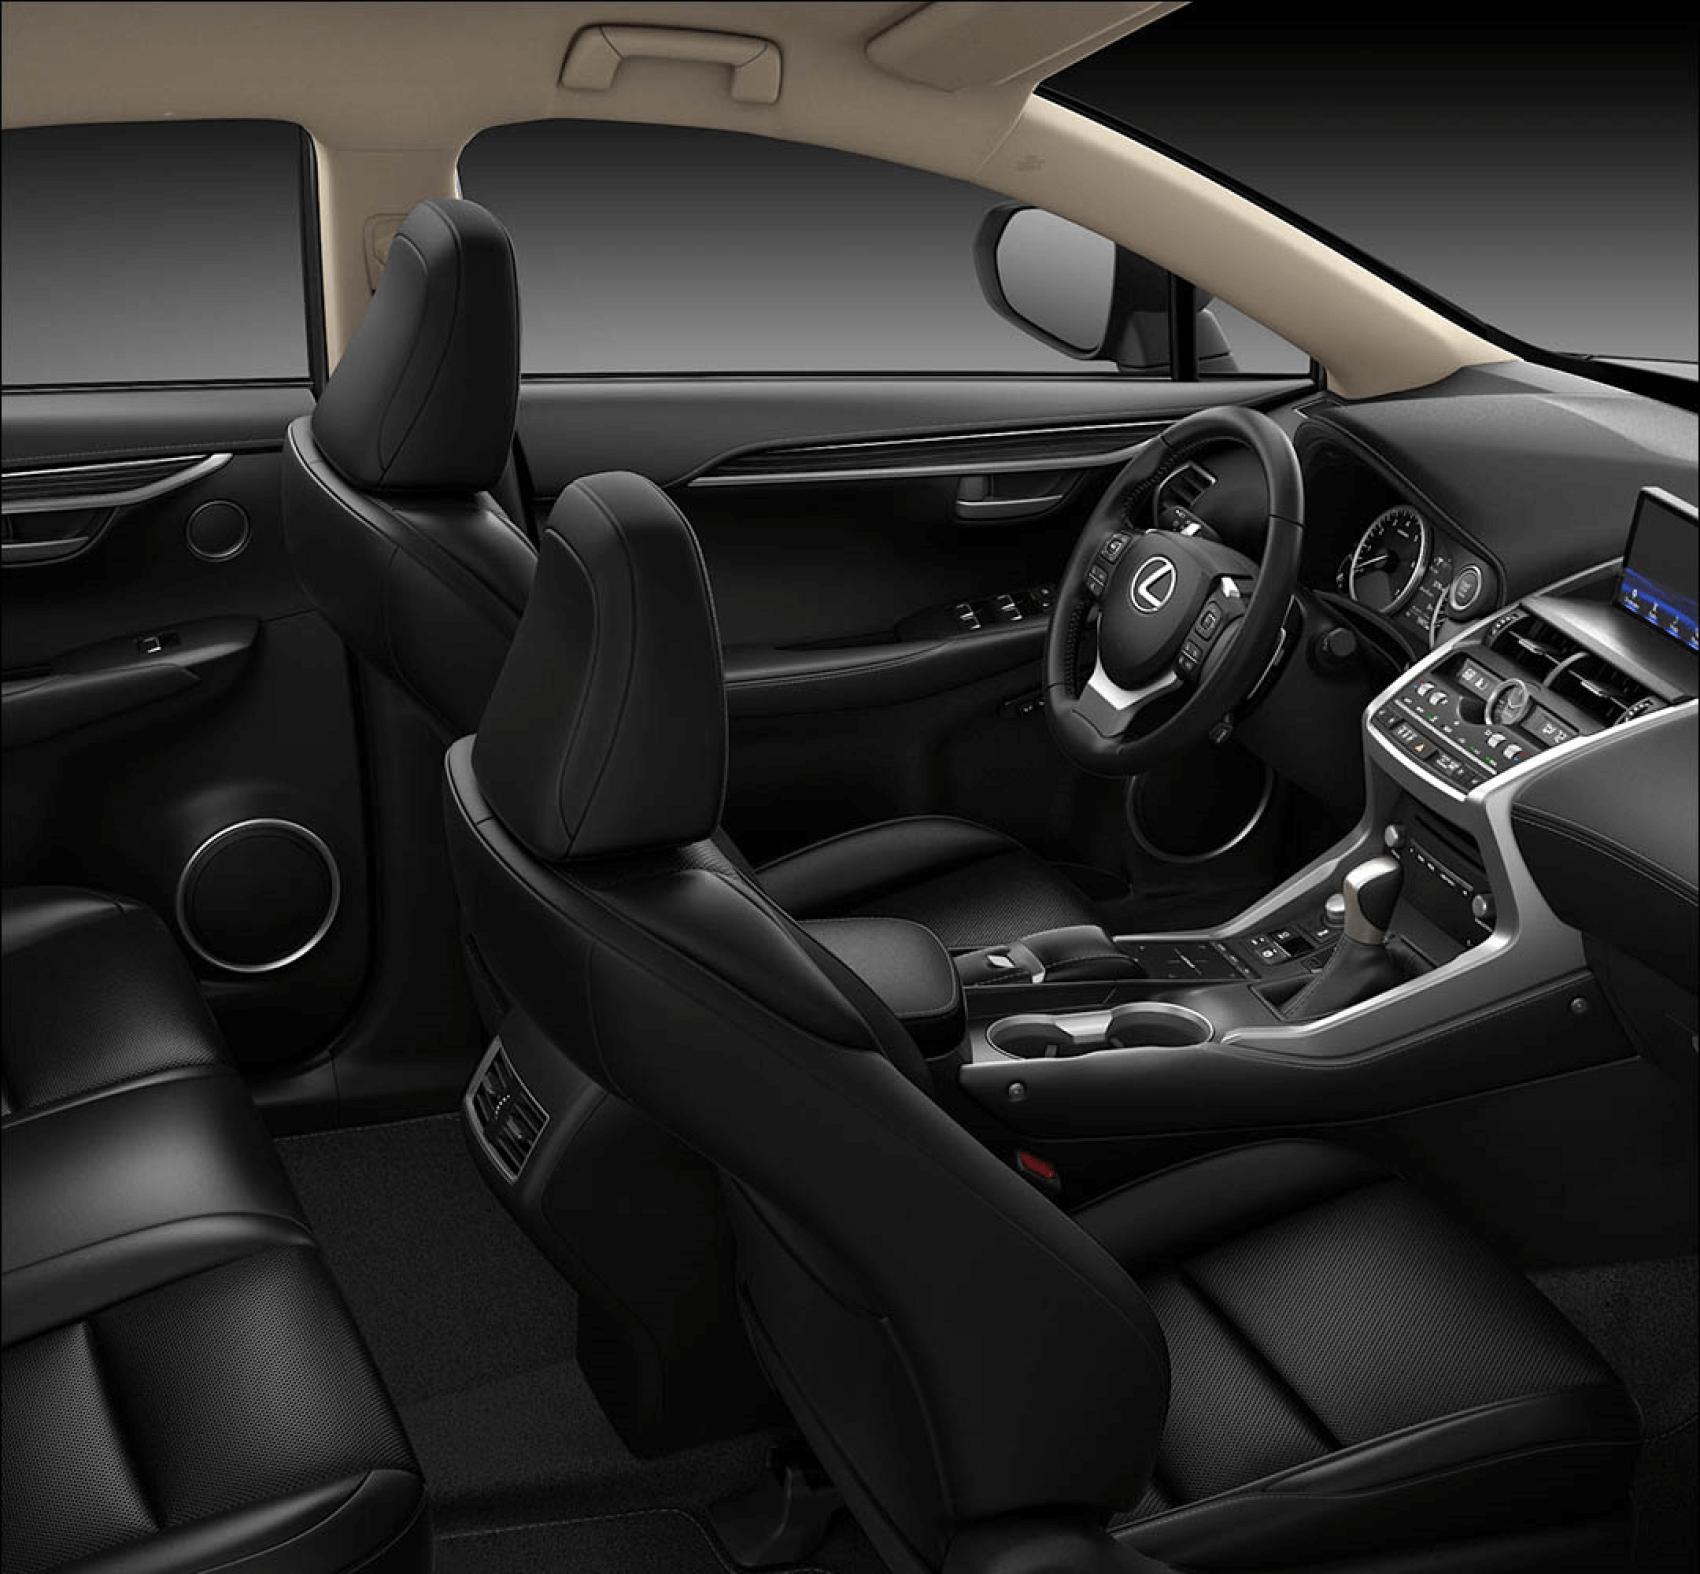 2021 Lexus NX Interior Cabin Space Lexus of Larchmont